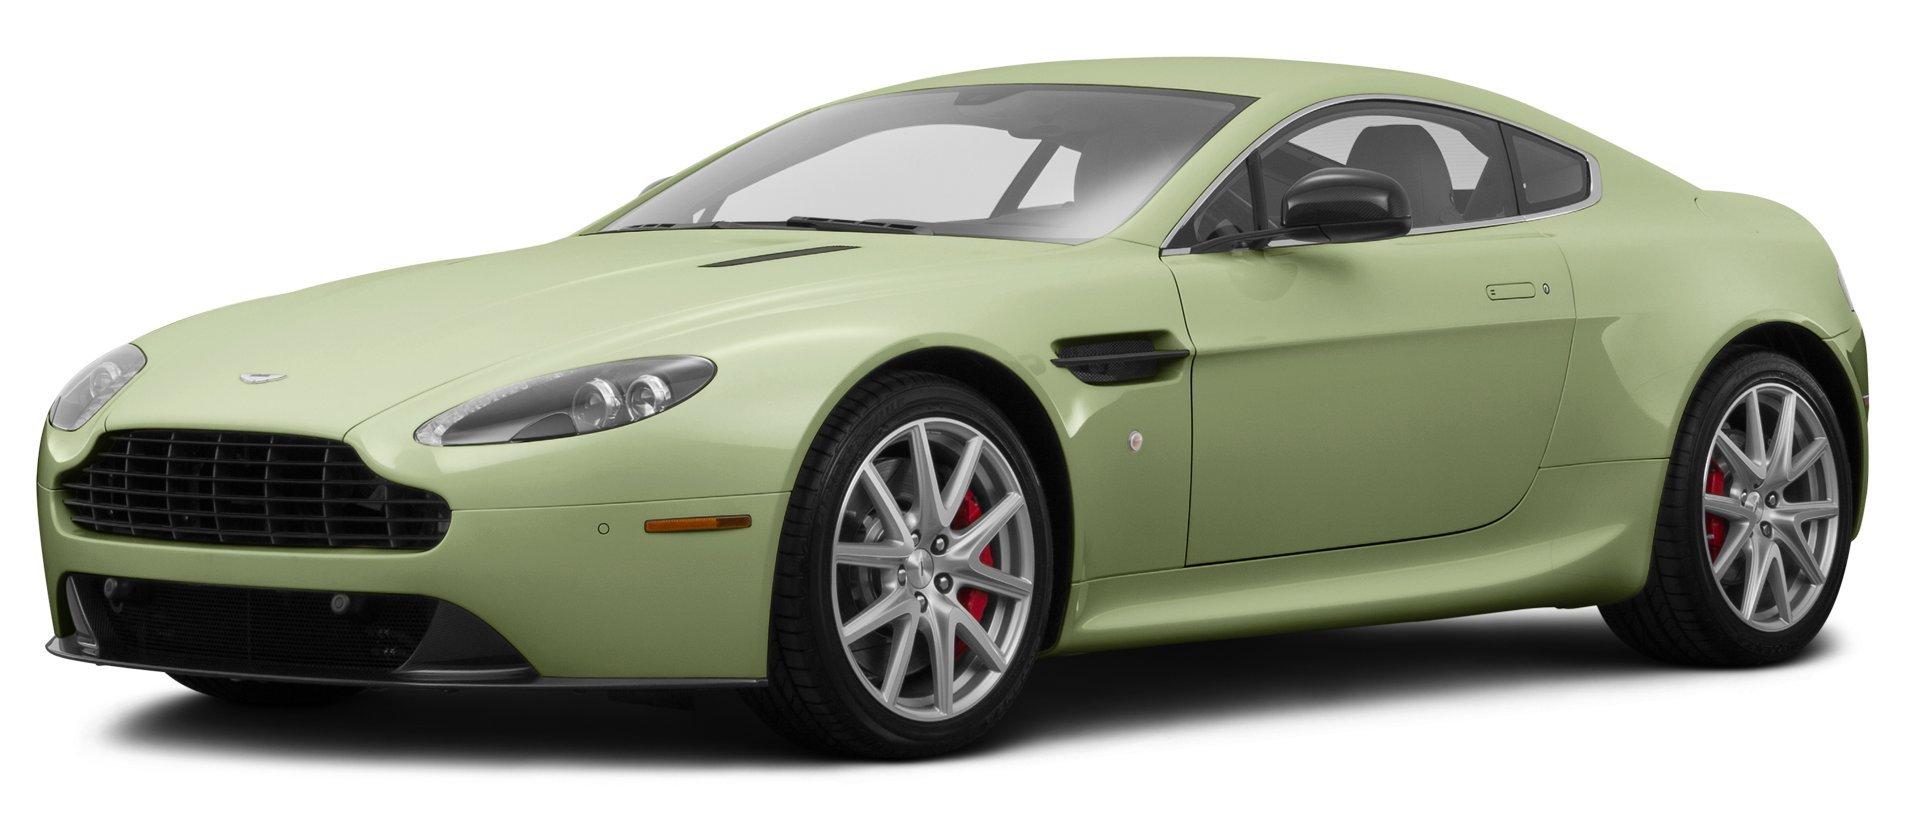 Amazon Com 2015 Aston Martin V8 Vantage Reviews Images And Specs